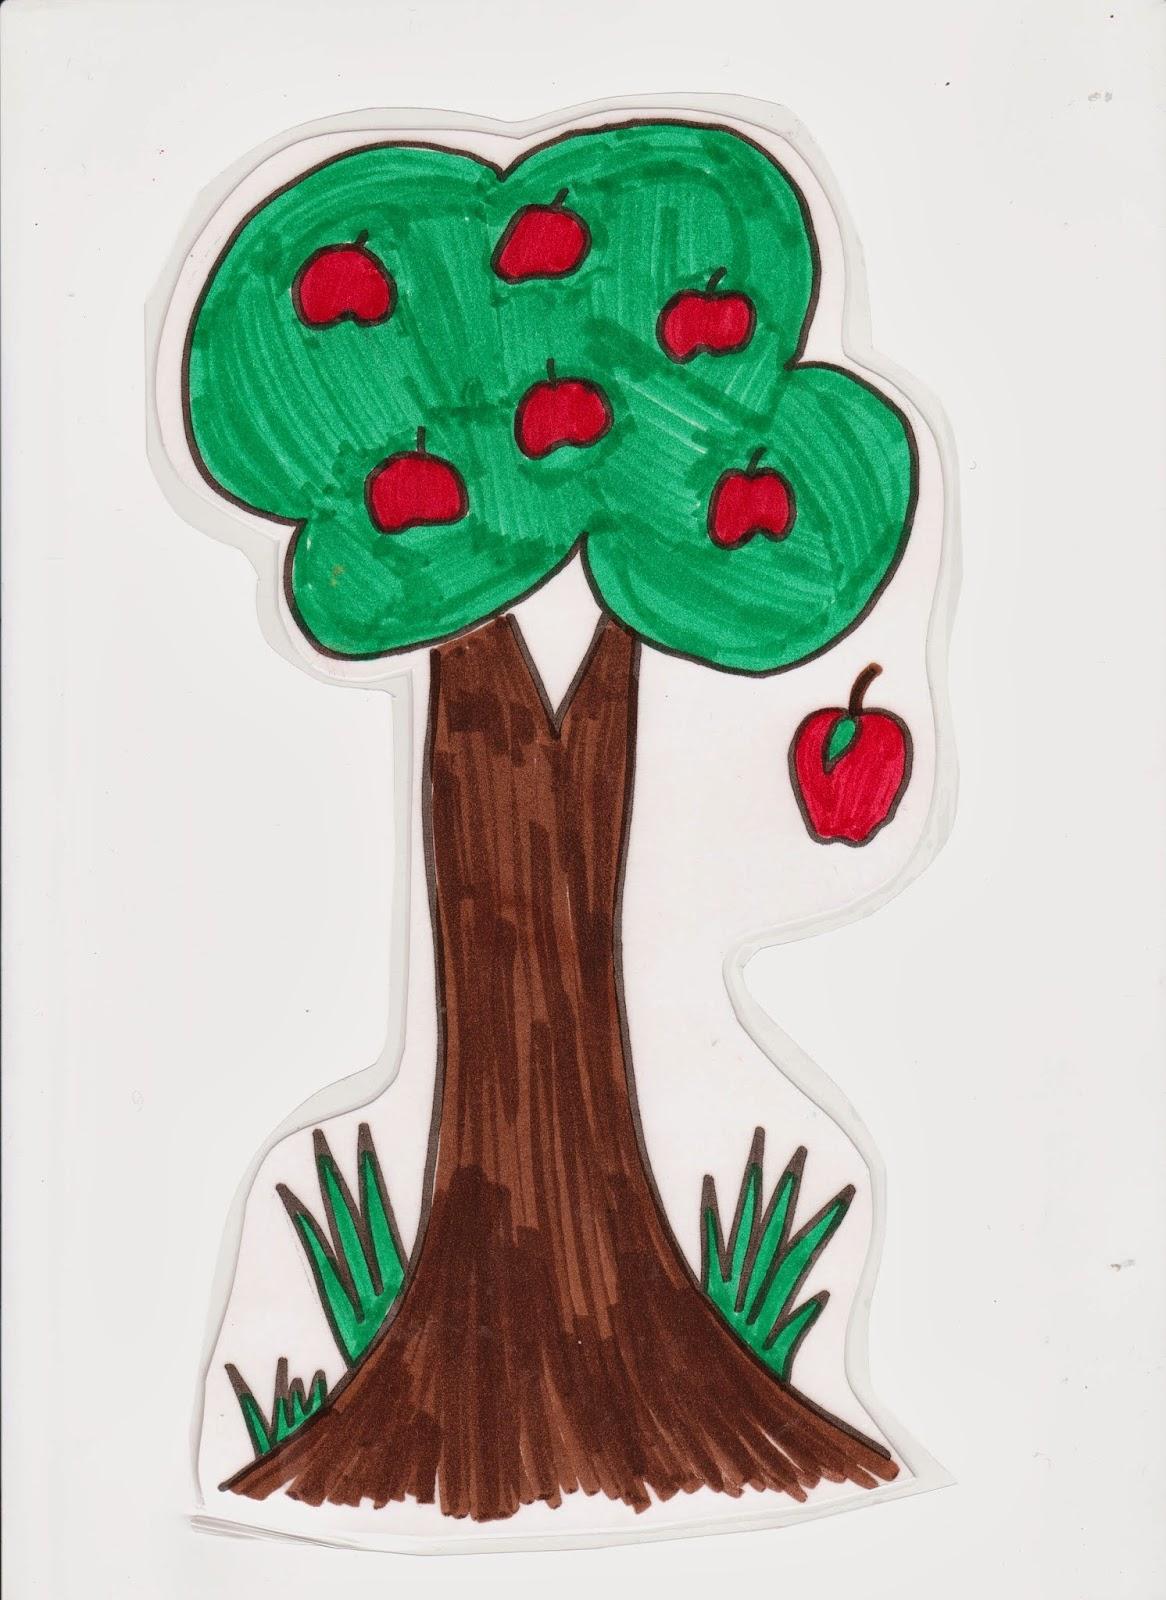 http://3.bp.blogspot.com/-Ec-k5-32nRQ/UzYPR24ovjI/AAAAAAAALB0/LIfrk0I34Qg/s1600/apple+tree+001.jpg